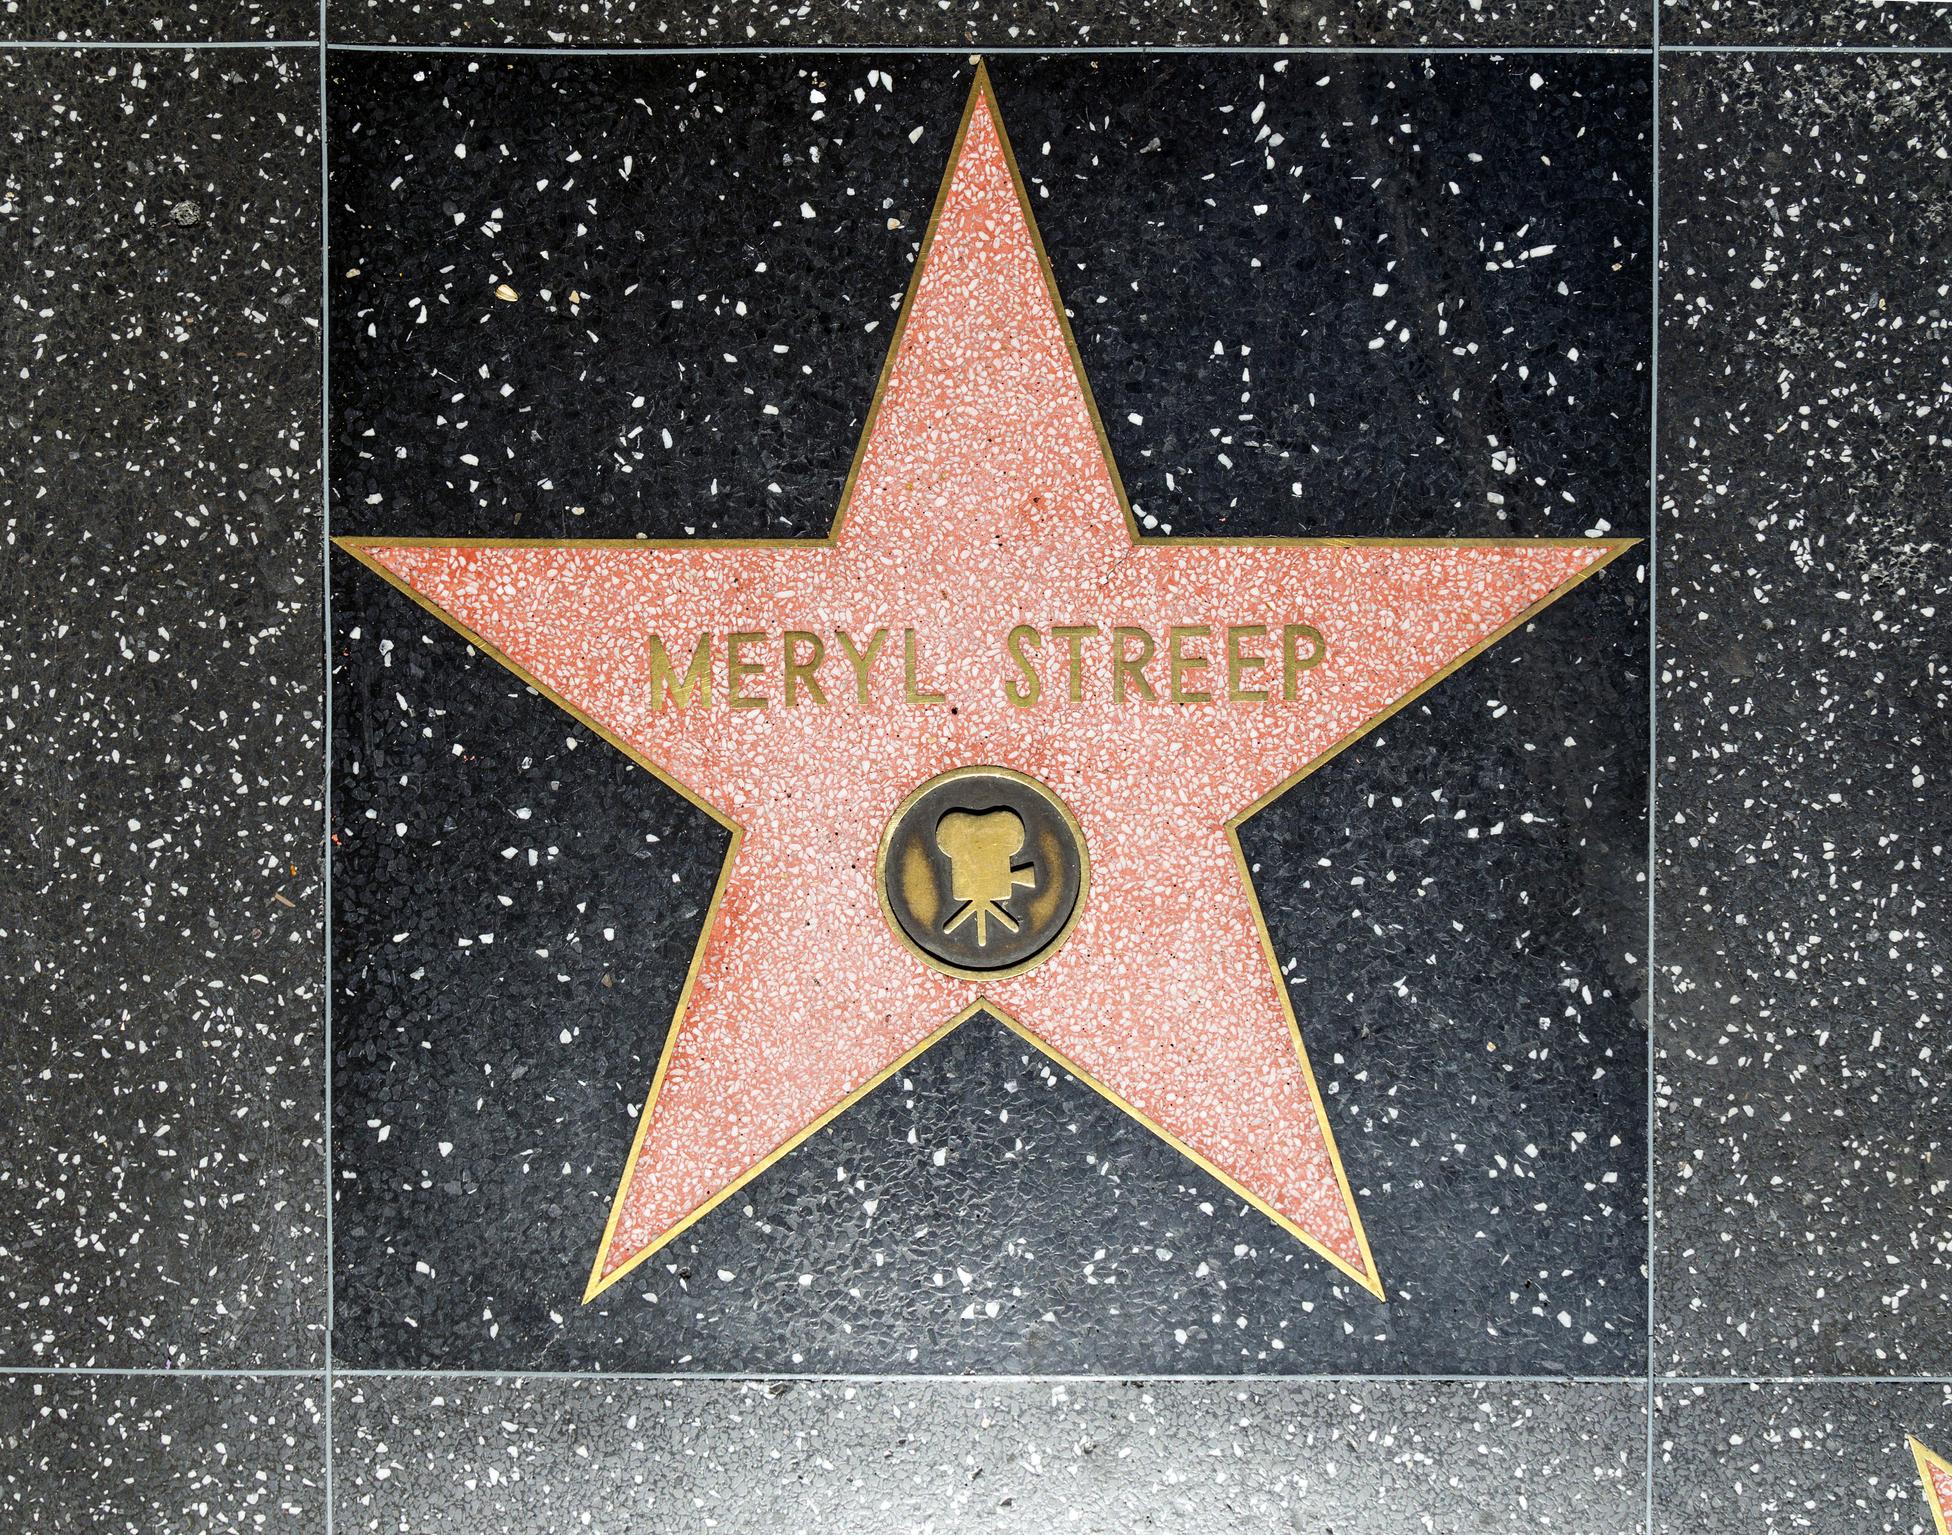 Porzellan Lady - Meryl Streep wird 70